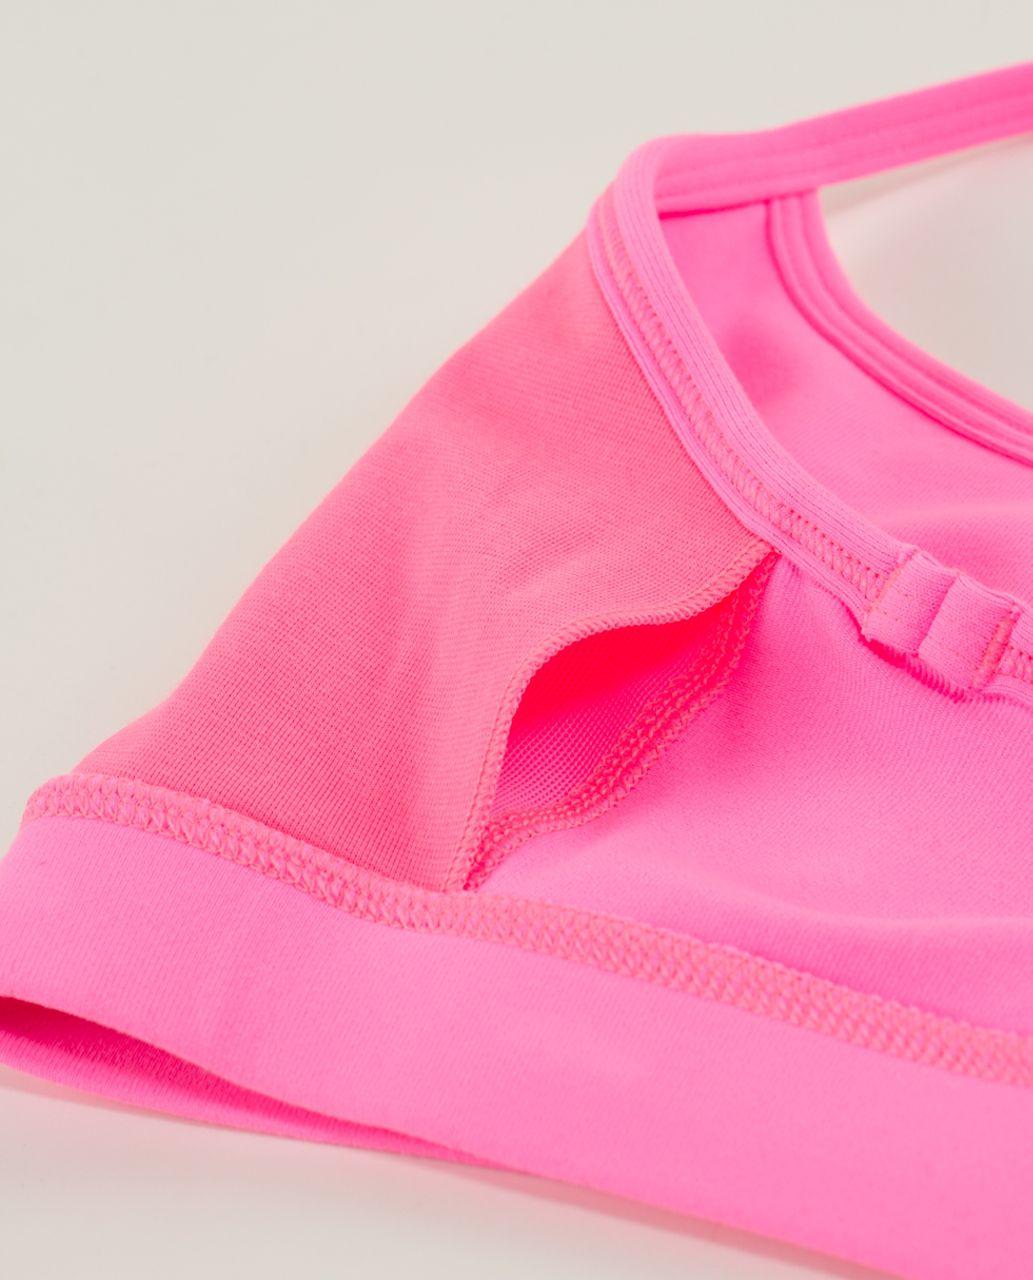 Lululemon Flow Y Bra IV - Zing Pink Light